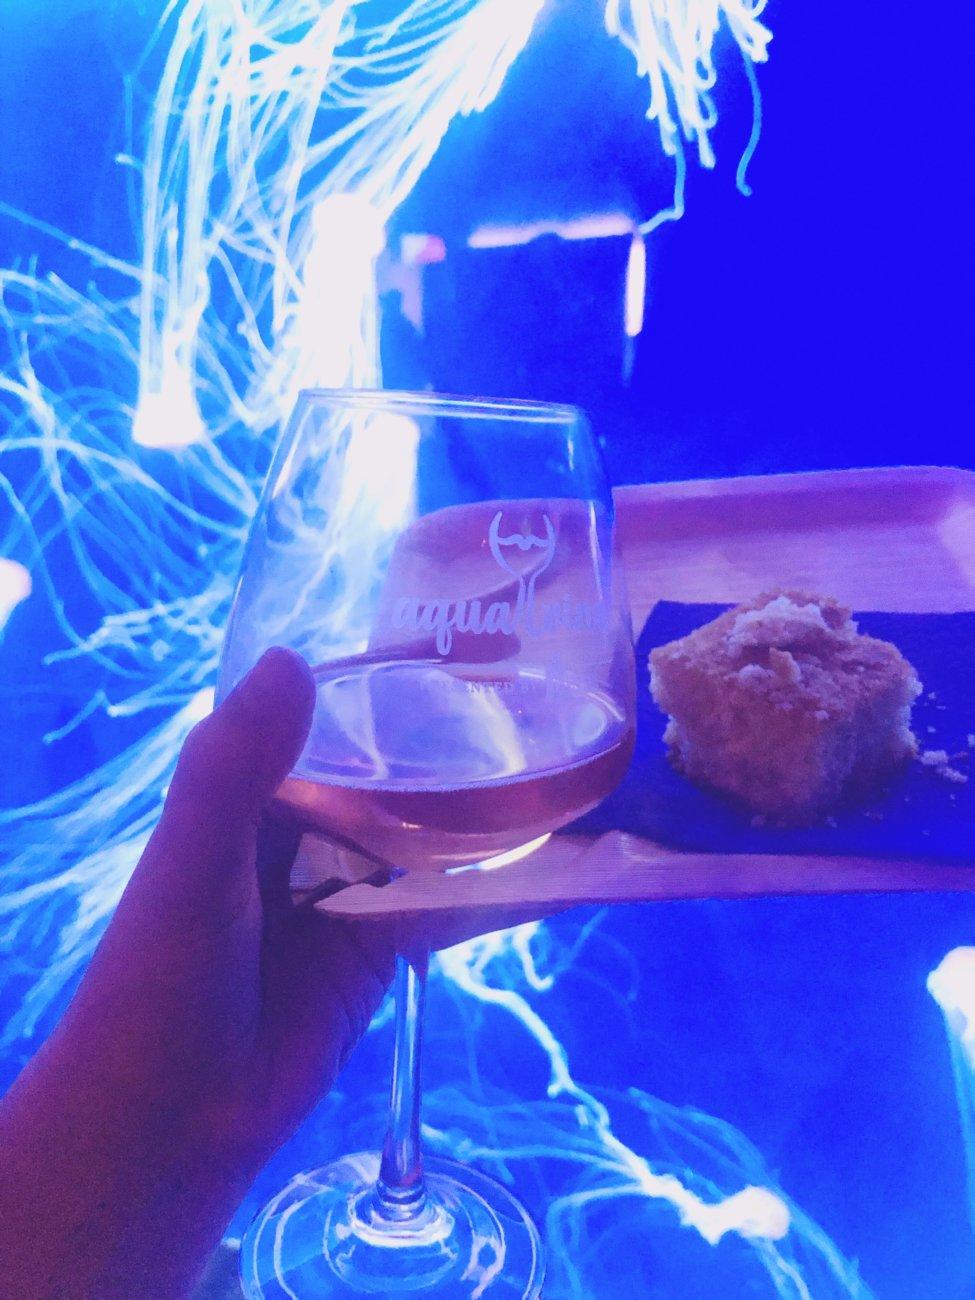 An entire night of food and wine at the Georgia Aquarium in Atlanta, Georgia...Aqua Vino is a night of live musical, local-inspired food tastings, and varieties of wine sampling! #georgiaaquarium #thingstodoinatlanta #atlantamustdo #eventsinatlanta Atlanta Georgia events | things to do in atlanta | special events in atlanta | georgia aquarium events | aqua vino event georgia aquarium | stuff to do in atlanta | atlanta blogger | atlanta georgia blog | atlanta GA